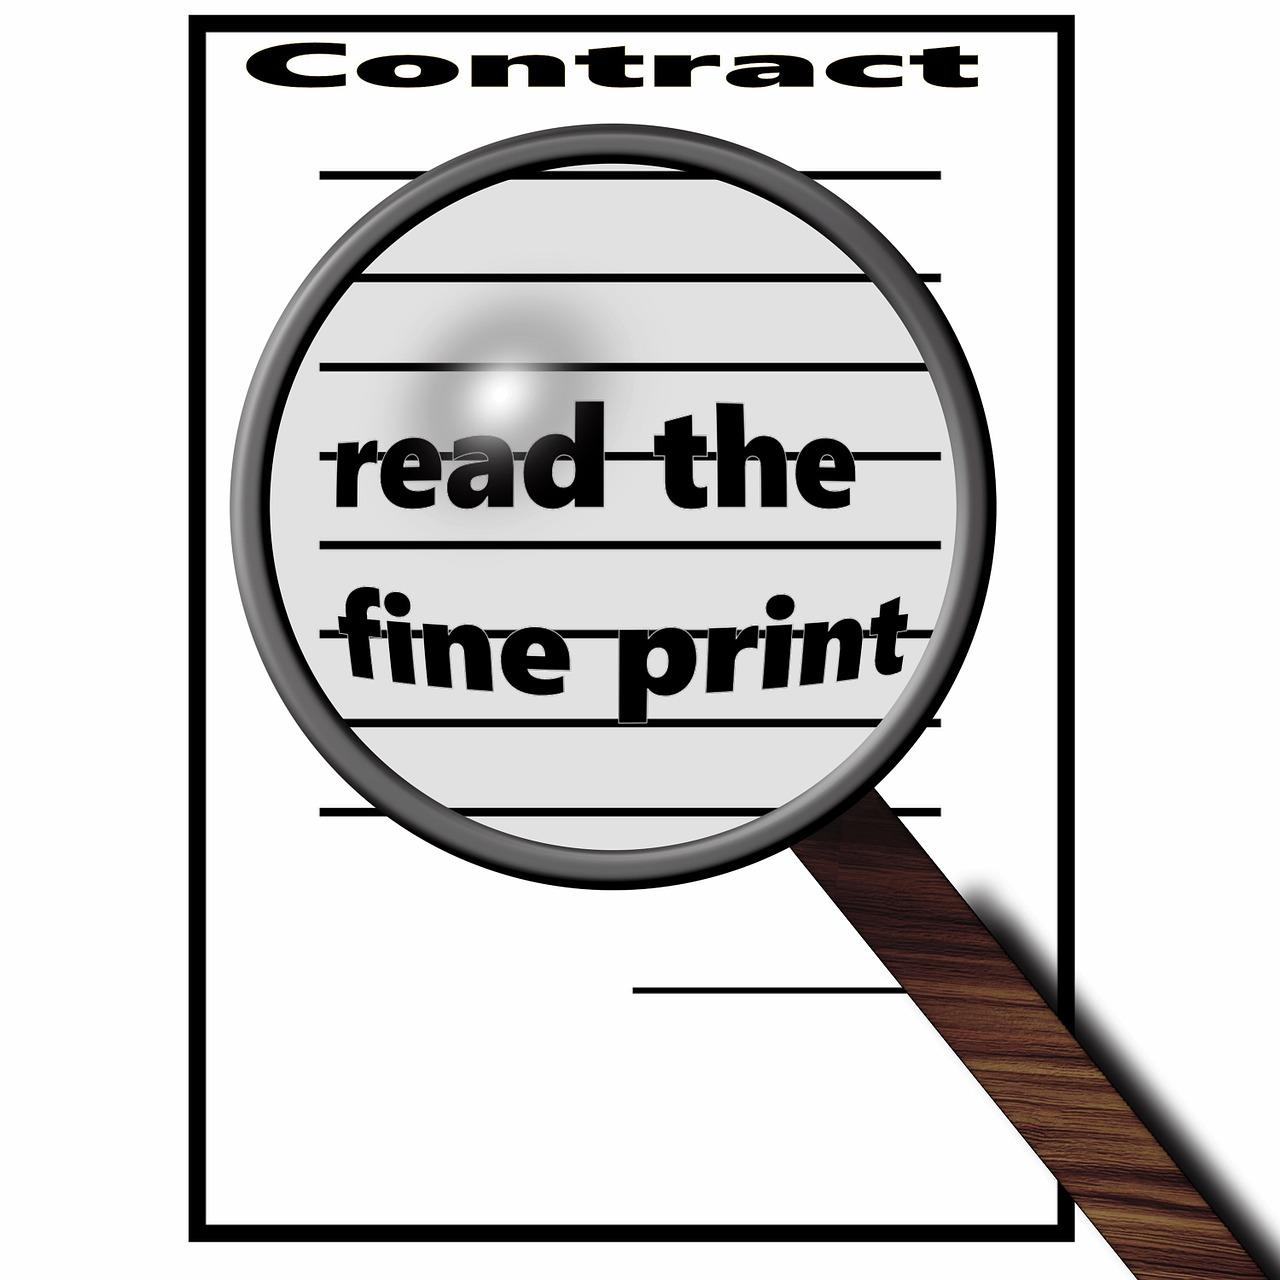 contract-1372189_1280.jpg